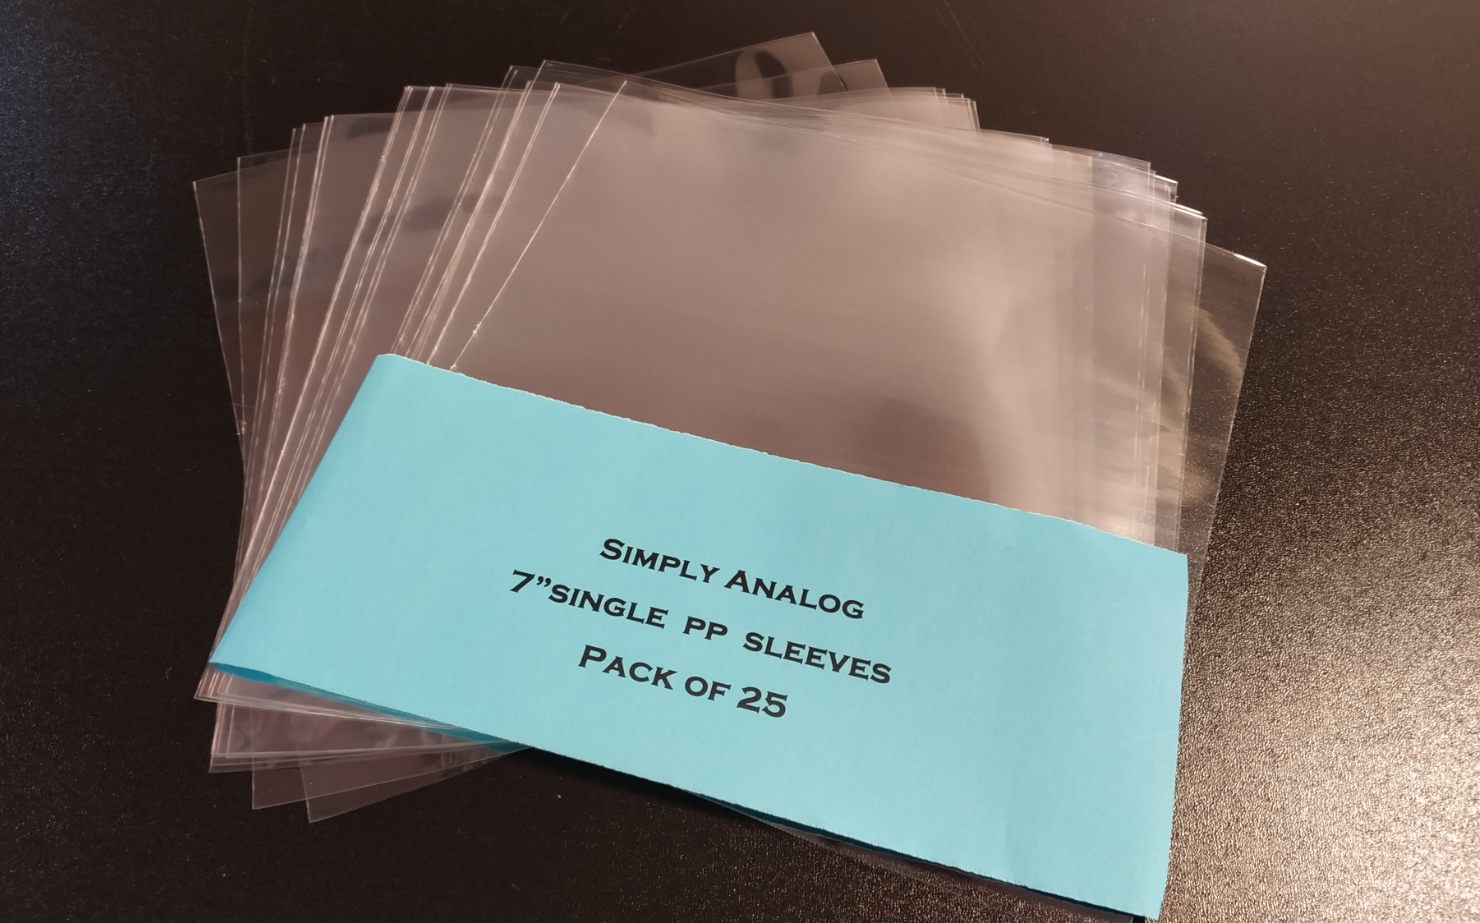 "Simply Analog - 7"" SINGLE PP SLEEVES"